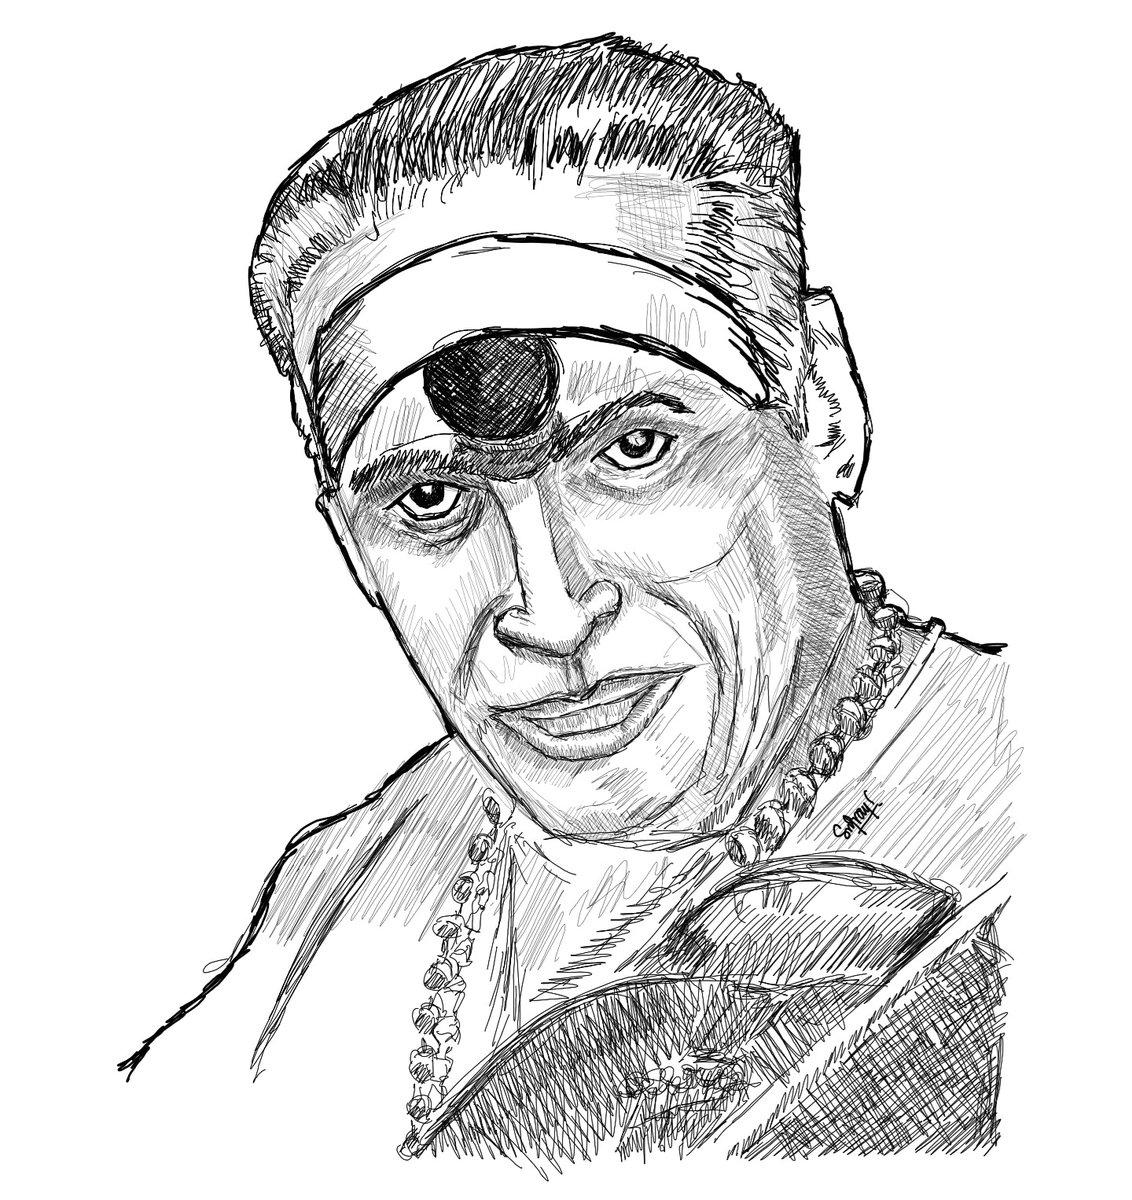 #kunnakudivaidhyanathan #Violinist #carnaticmusic #carnaticsmusician #portraitart #portrairtdrawings #sketches #blackandwhite #digitalart #digitaldrawing #sriramsvision #thrutheeyesofnidhi #penart #ArtistOnTwitter #art